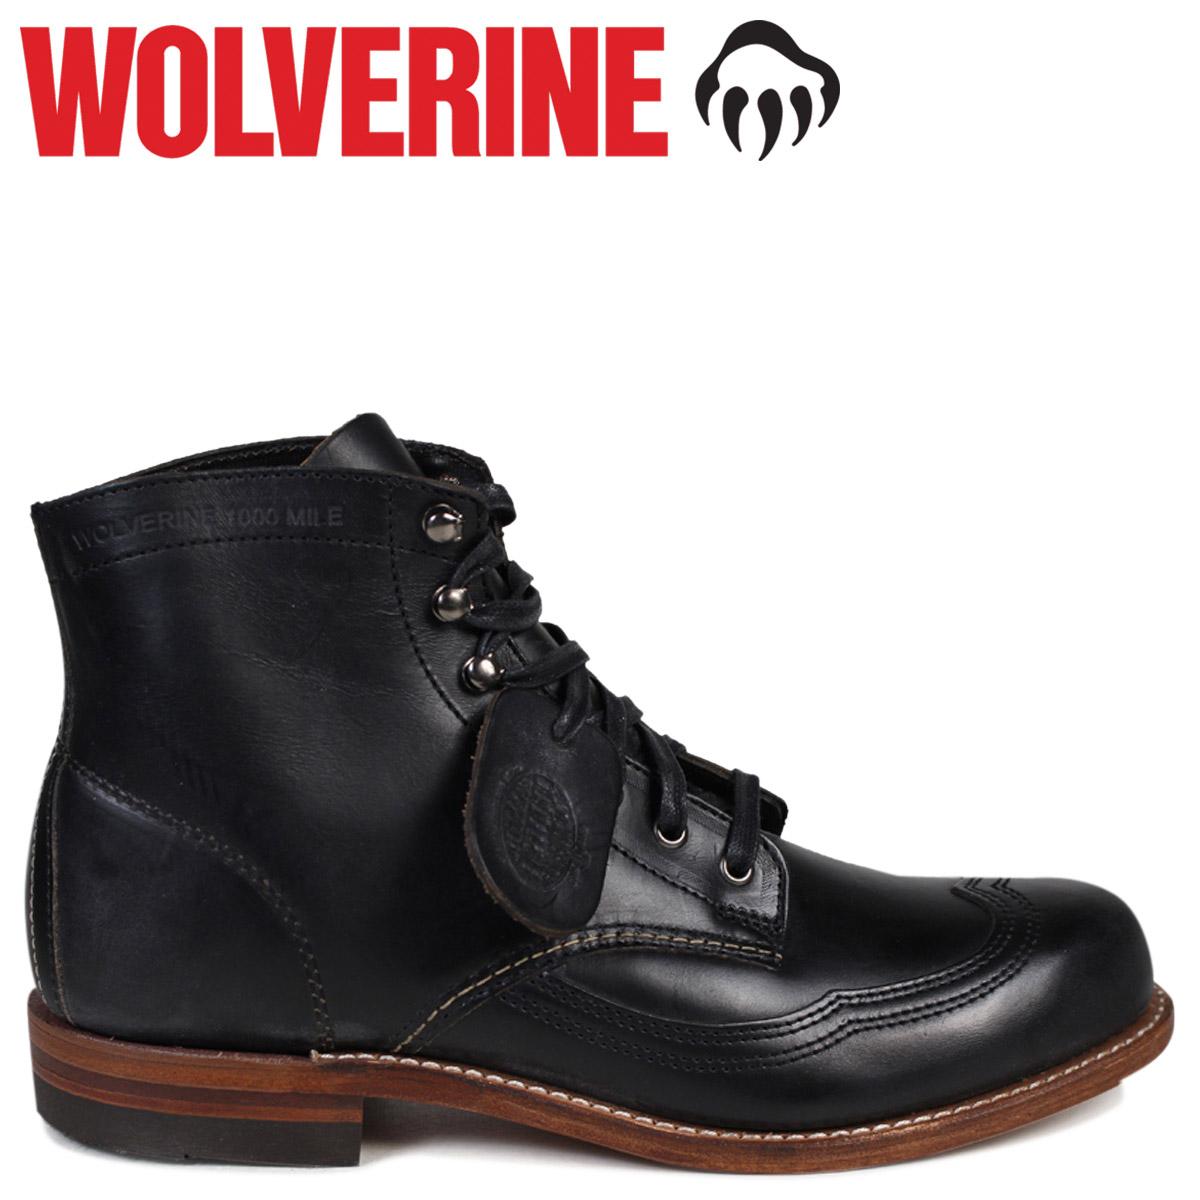 528d7866730 WOLVERINE Wolverene 1,000 miles boots ADDISON 1000MILE WINGTIP BOOT D Wise  W05344 black black wing tip work boots men